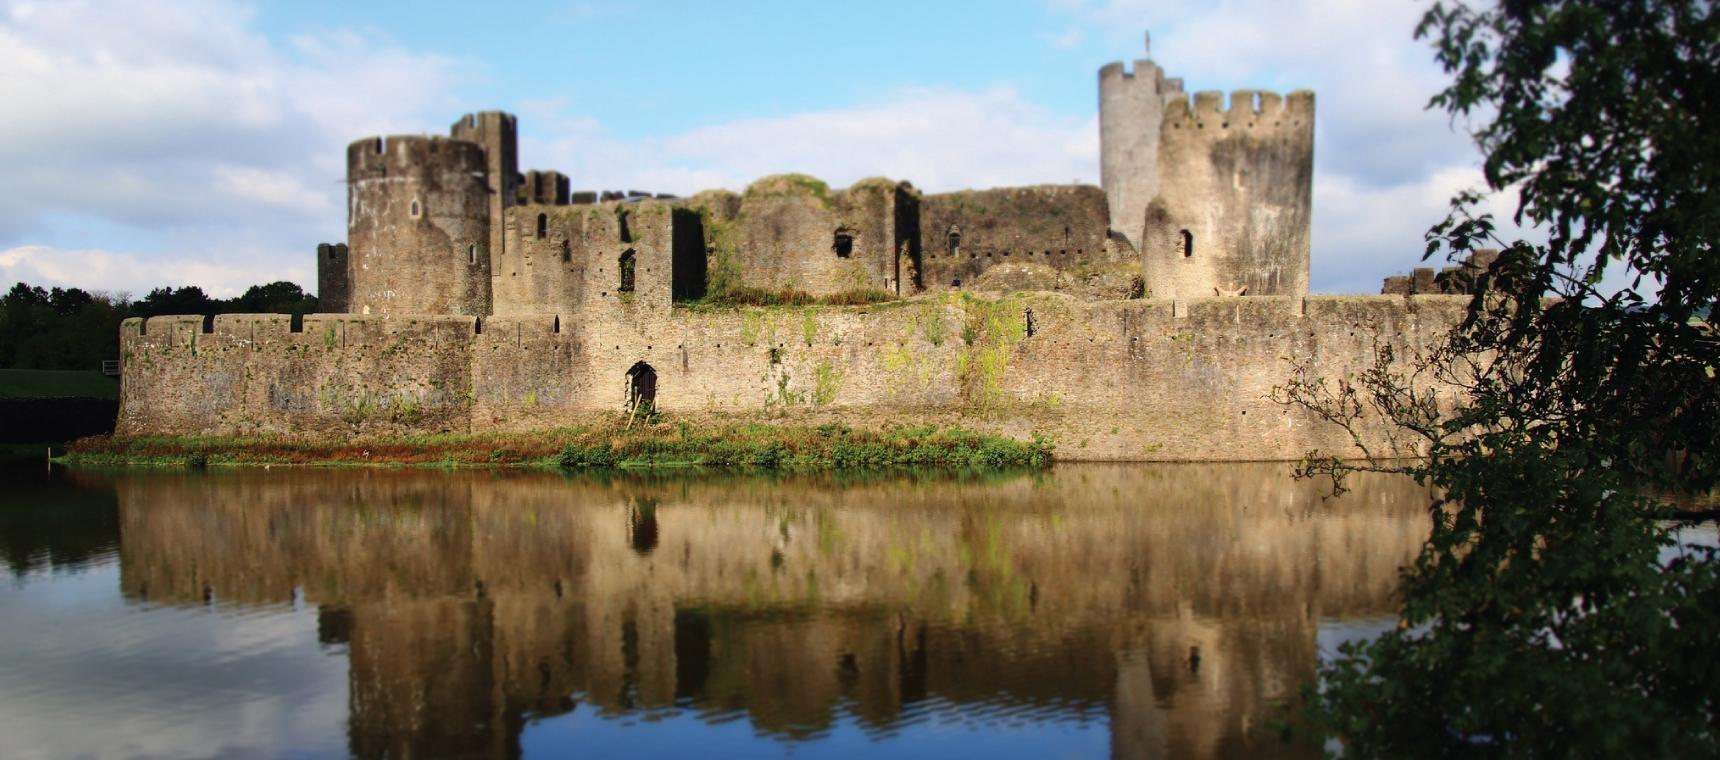 Caerphilly Castle by nicolerugman https://www.flickr.com/photos/nicolerugman/10335913013/